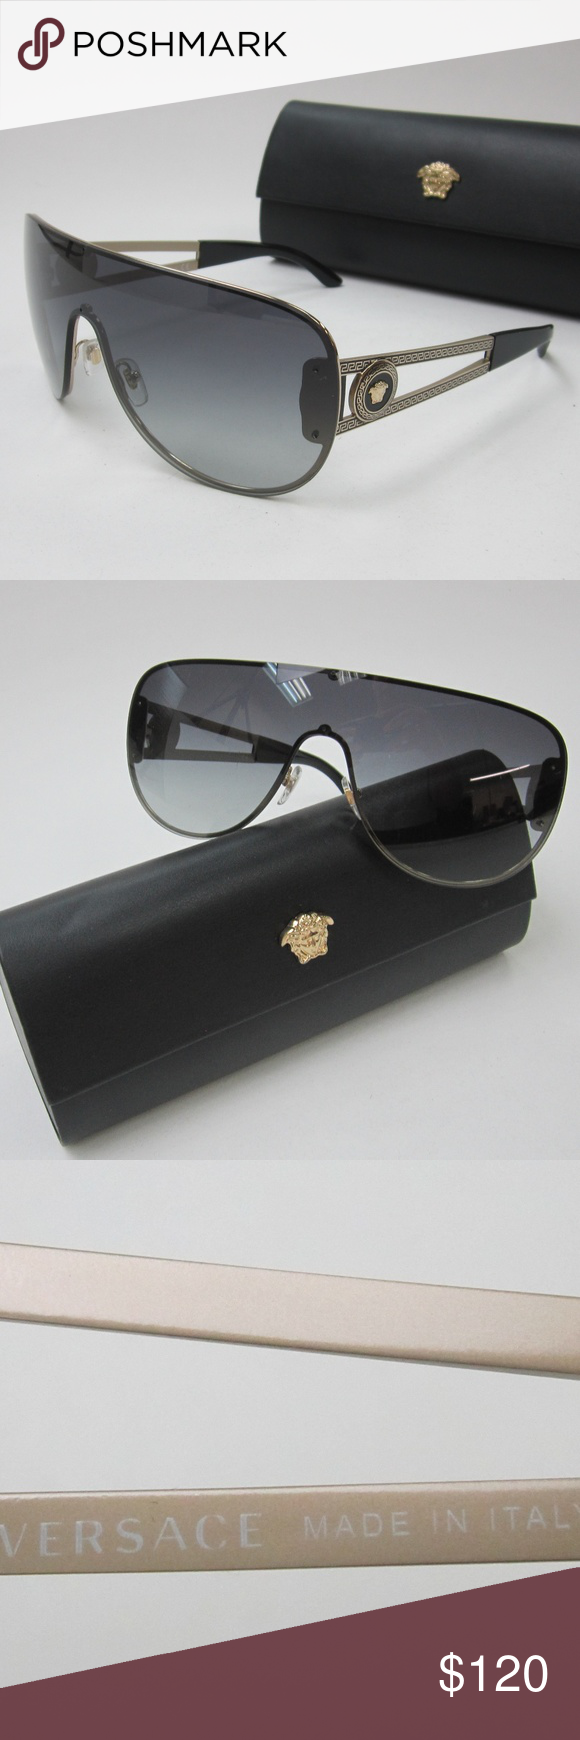 12162b18835 Versace 2166 1252 8G Men s Sunglasses Italy OLL836 Versace Medusa 2166 1252